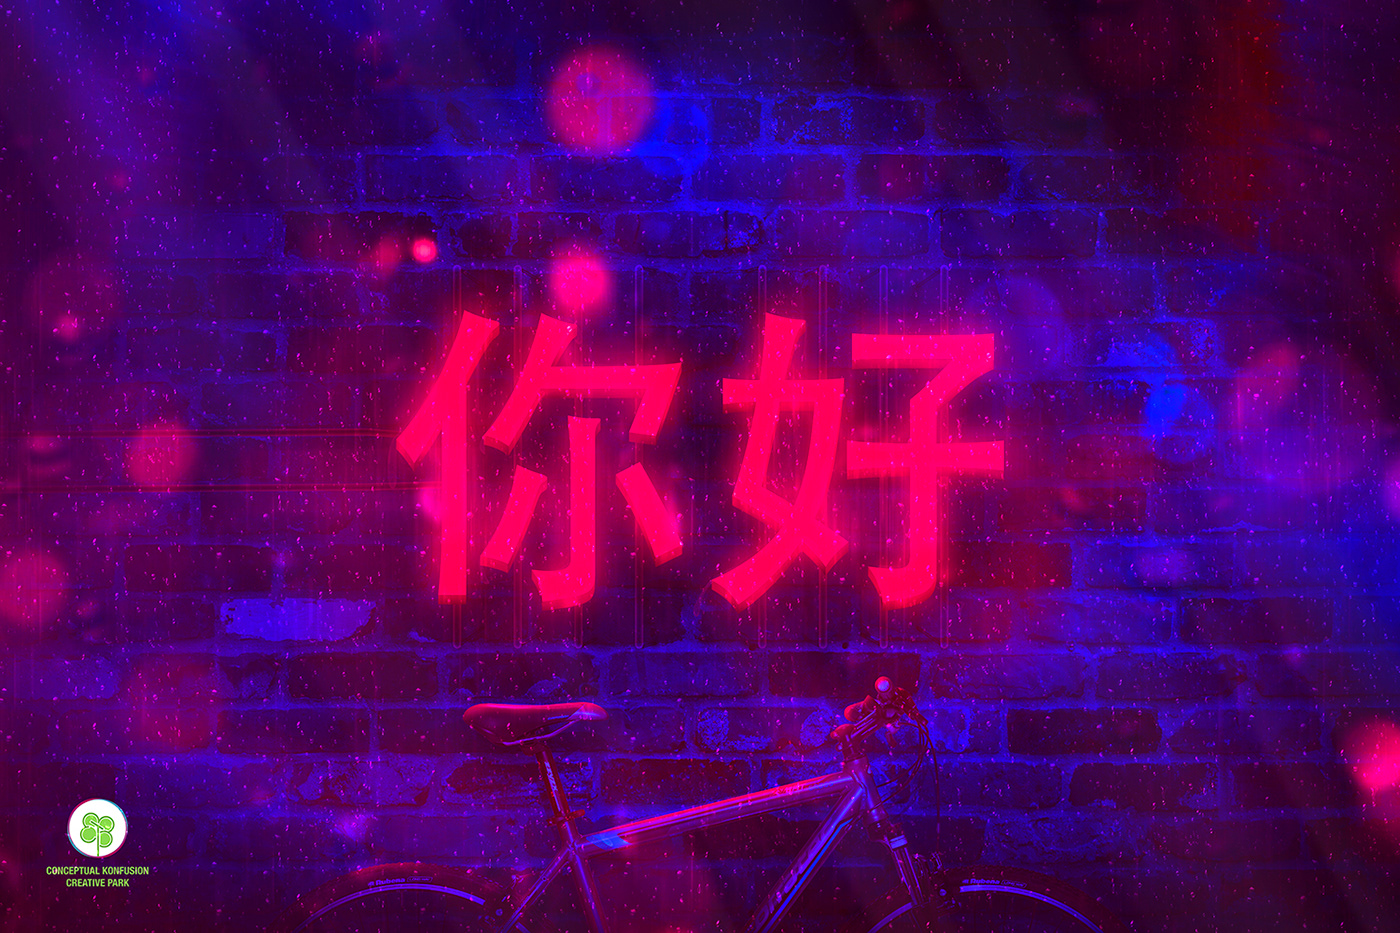 neon mandarin chinese wall Bike view Window rainy day Beautiful weather